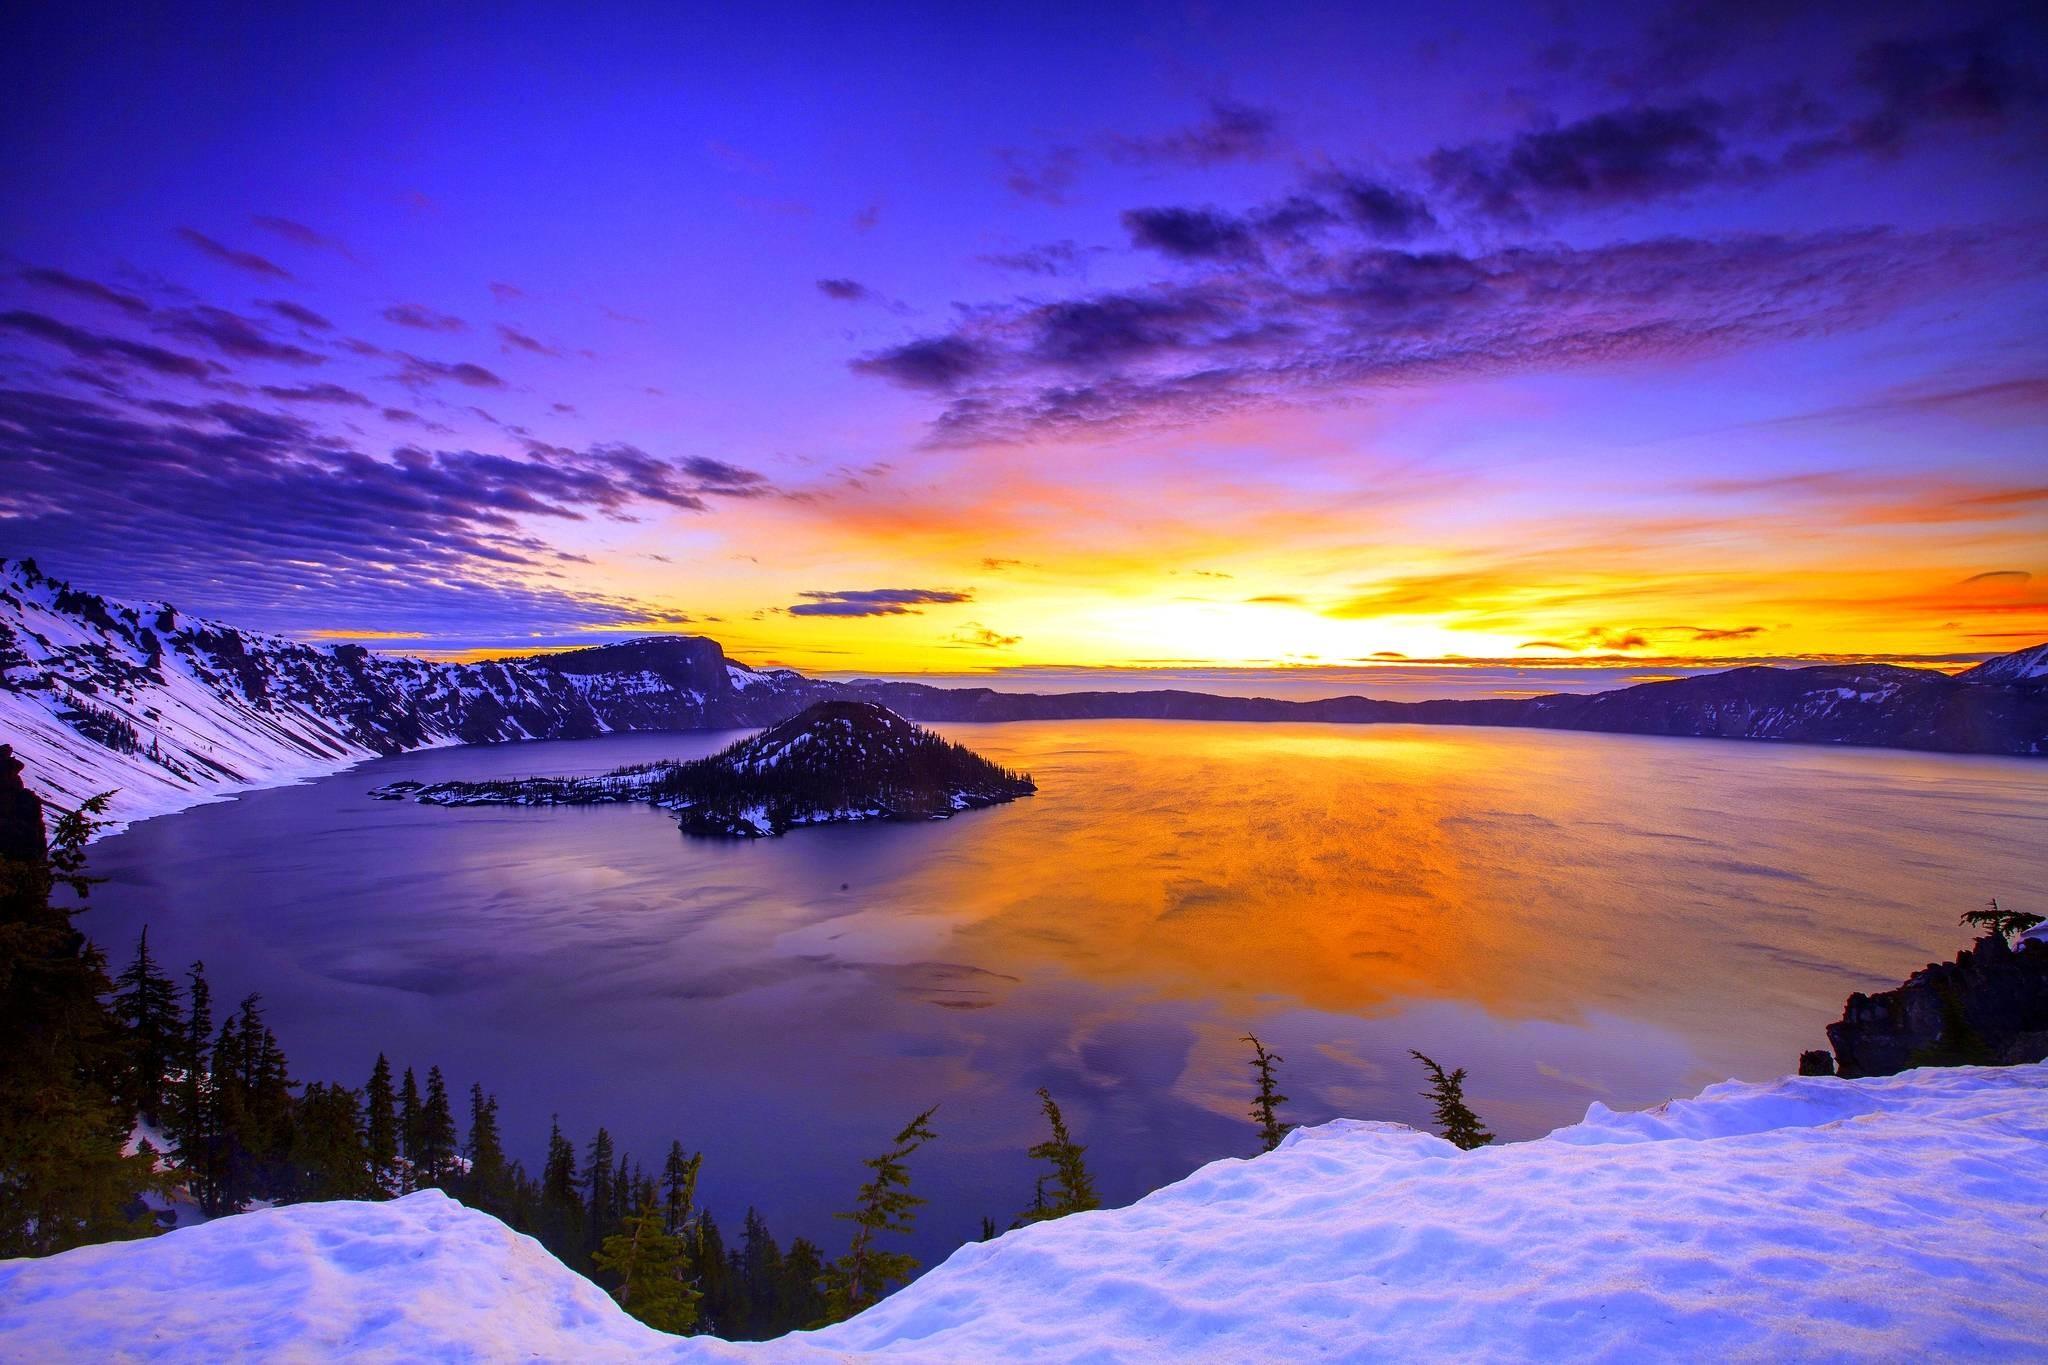 Gorgeous HD Sunset Wallpapers HDWallSource. Sunset HD Wallpapers  Backgrounds Wallpaper 2048×1365